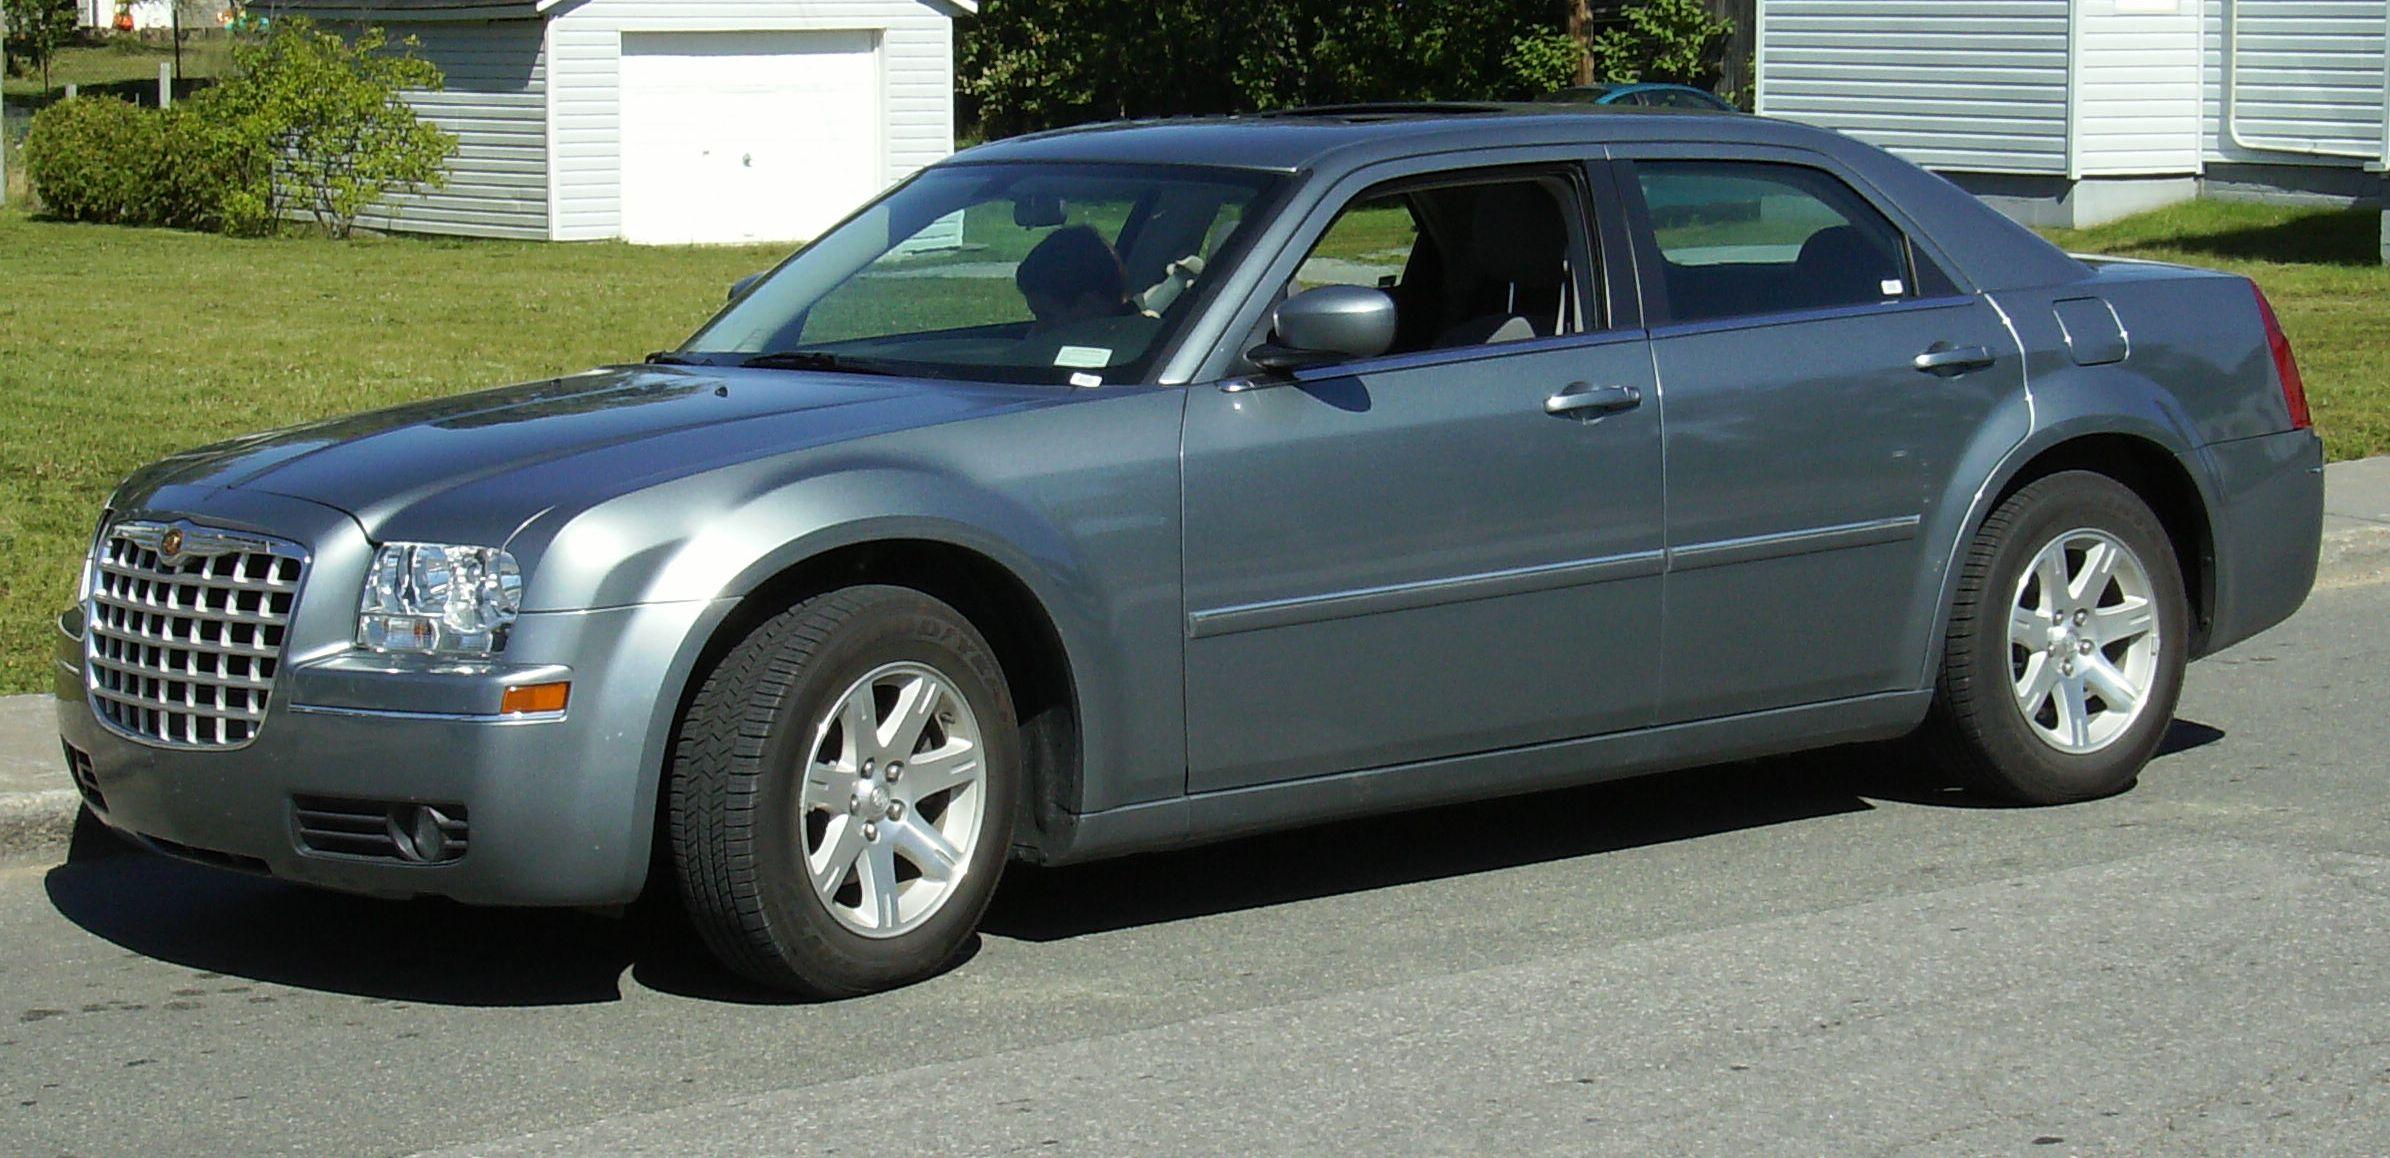 File Chrysler 300 In Canada Jpg Wikimedia Commons